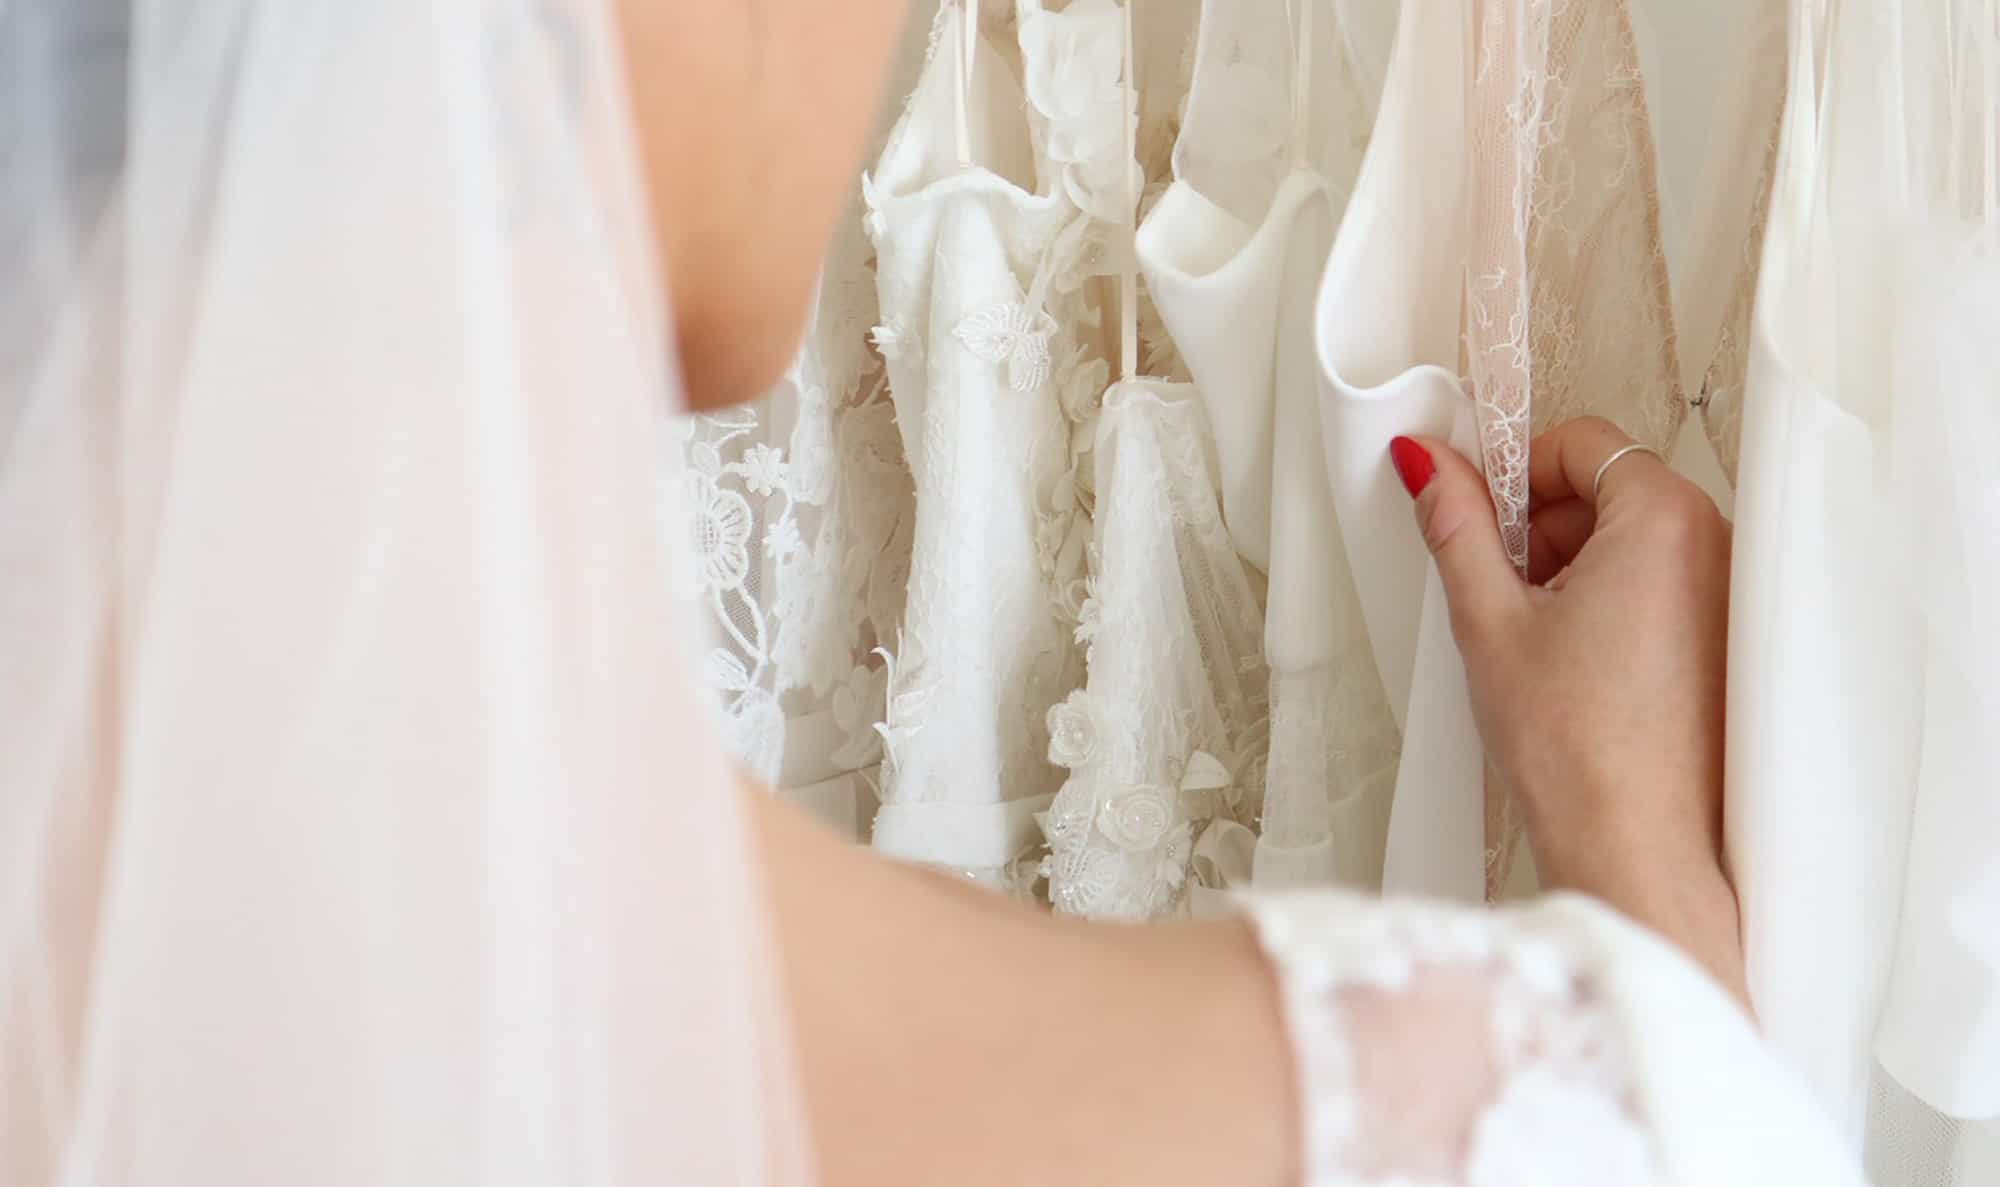 Création de robe de mariée à Marseille   Essayage